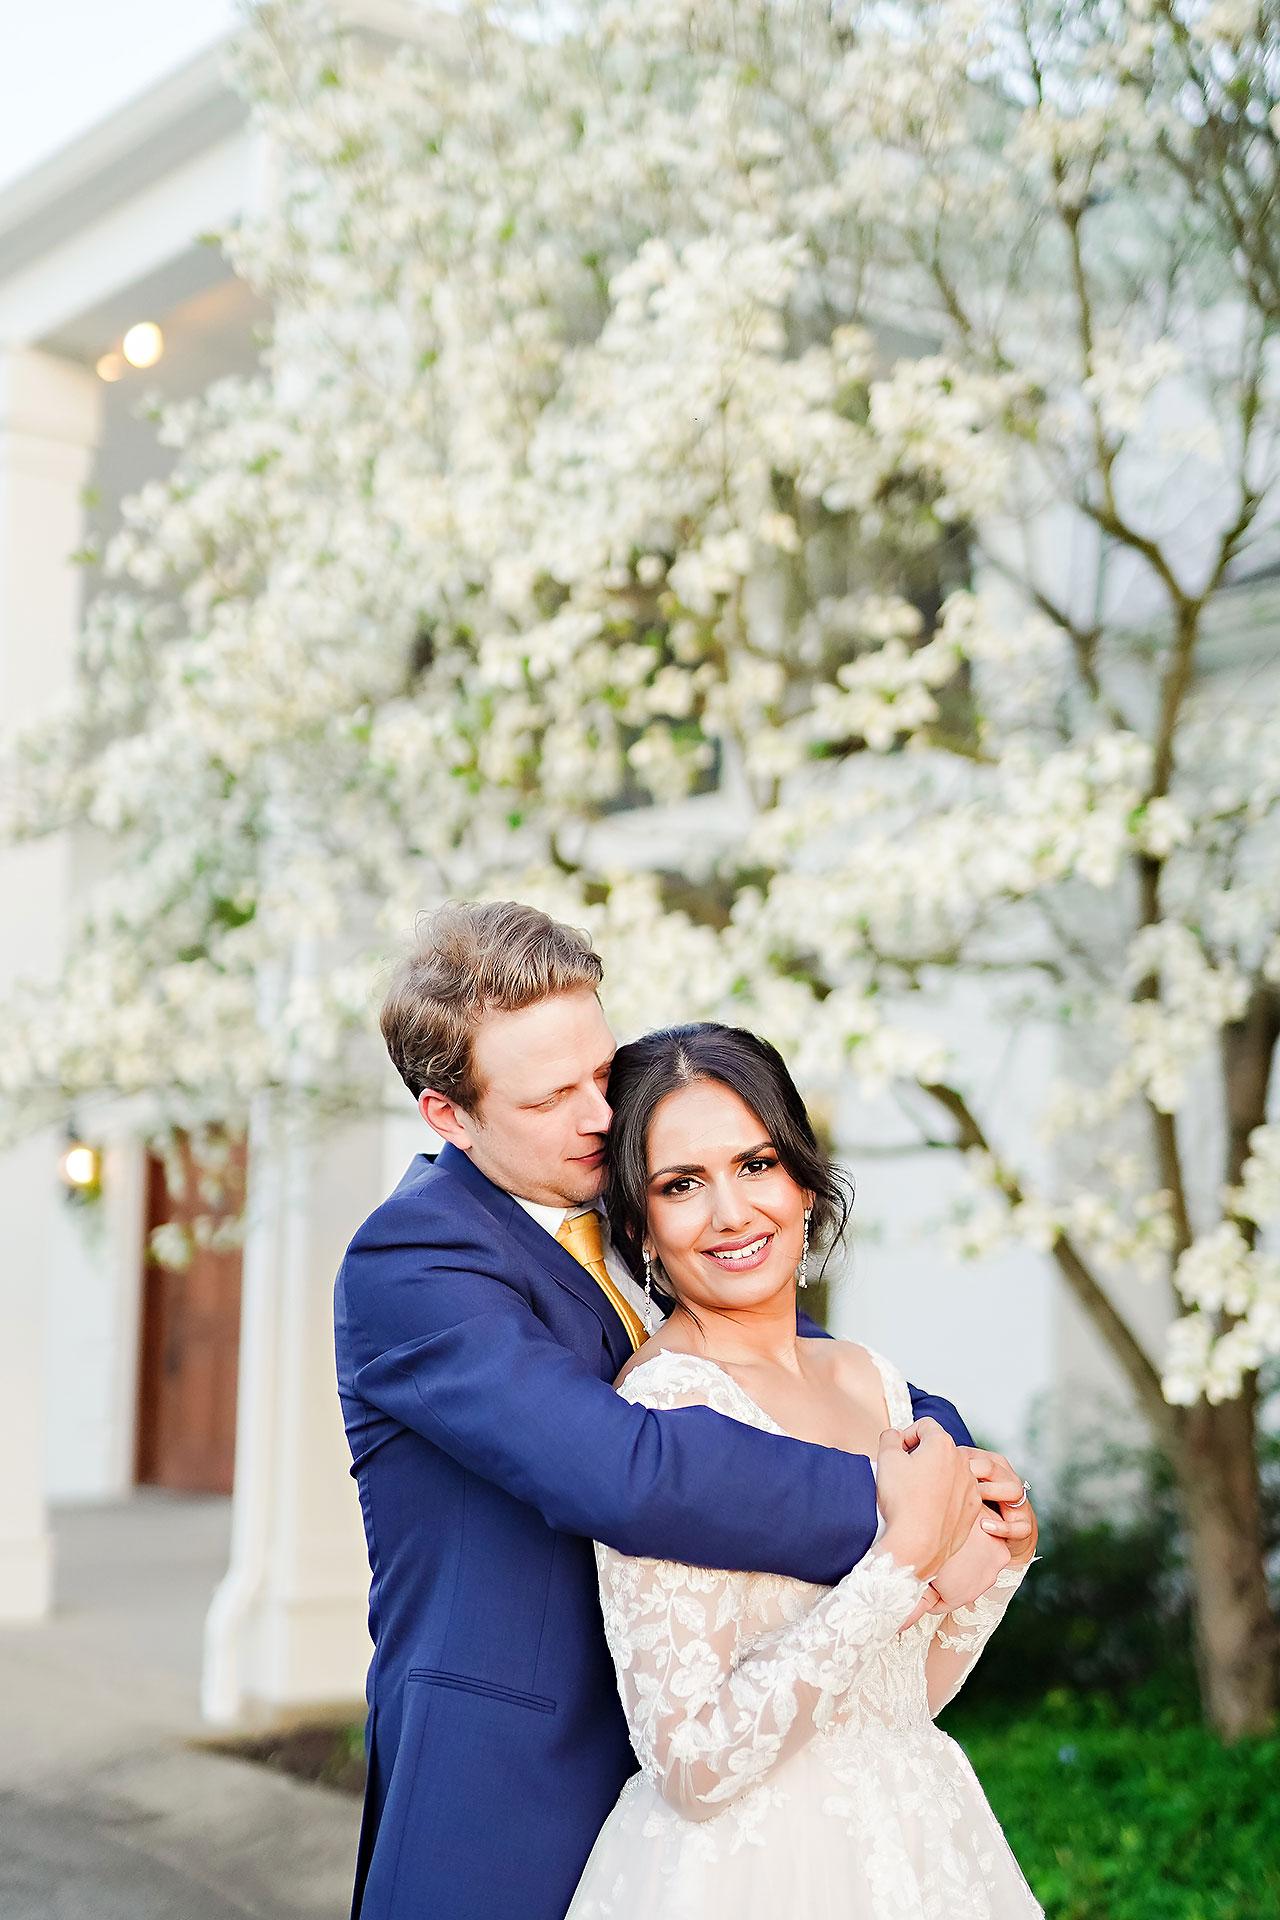 Nadia Parker Black Iris Estate Carmel Indiana Wedding May 2021 274